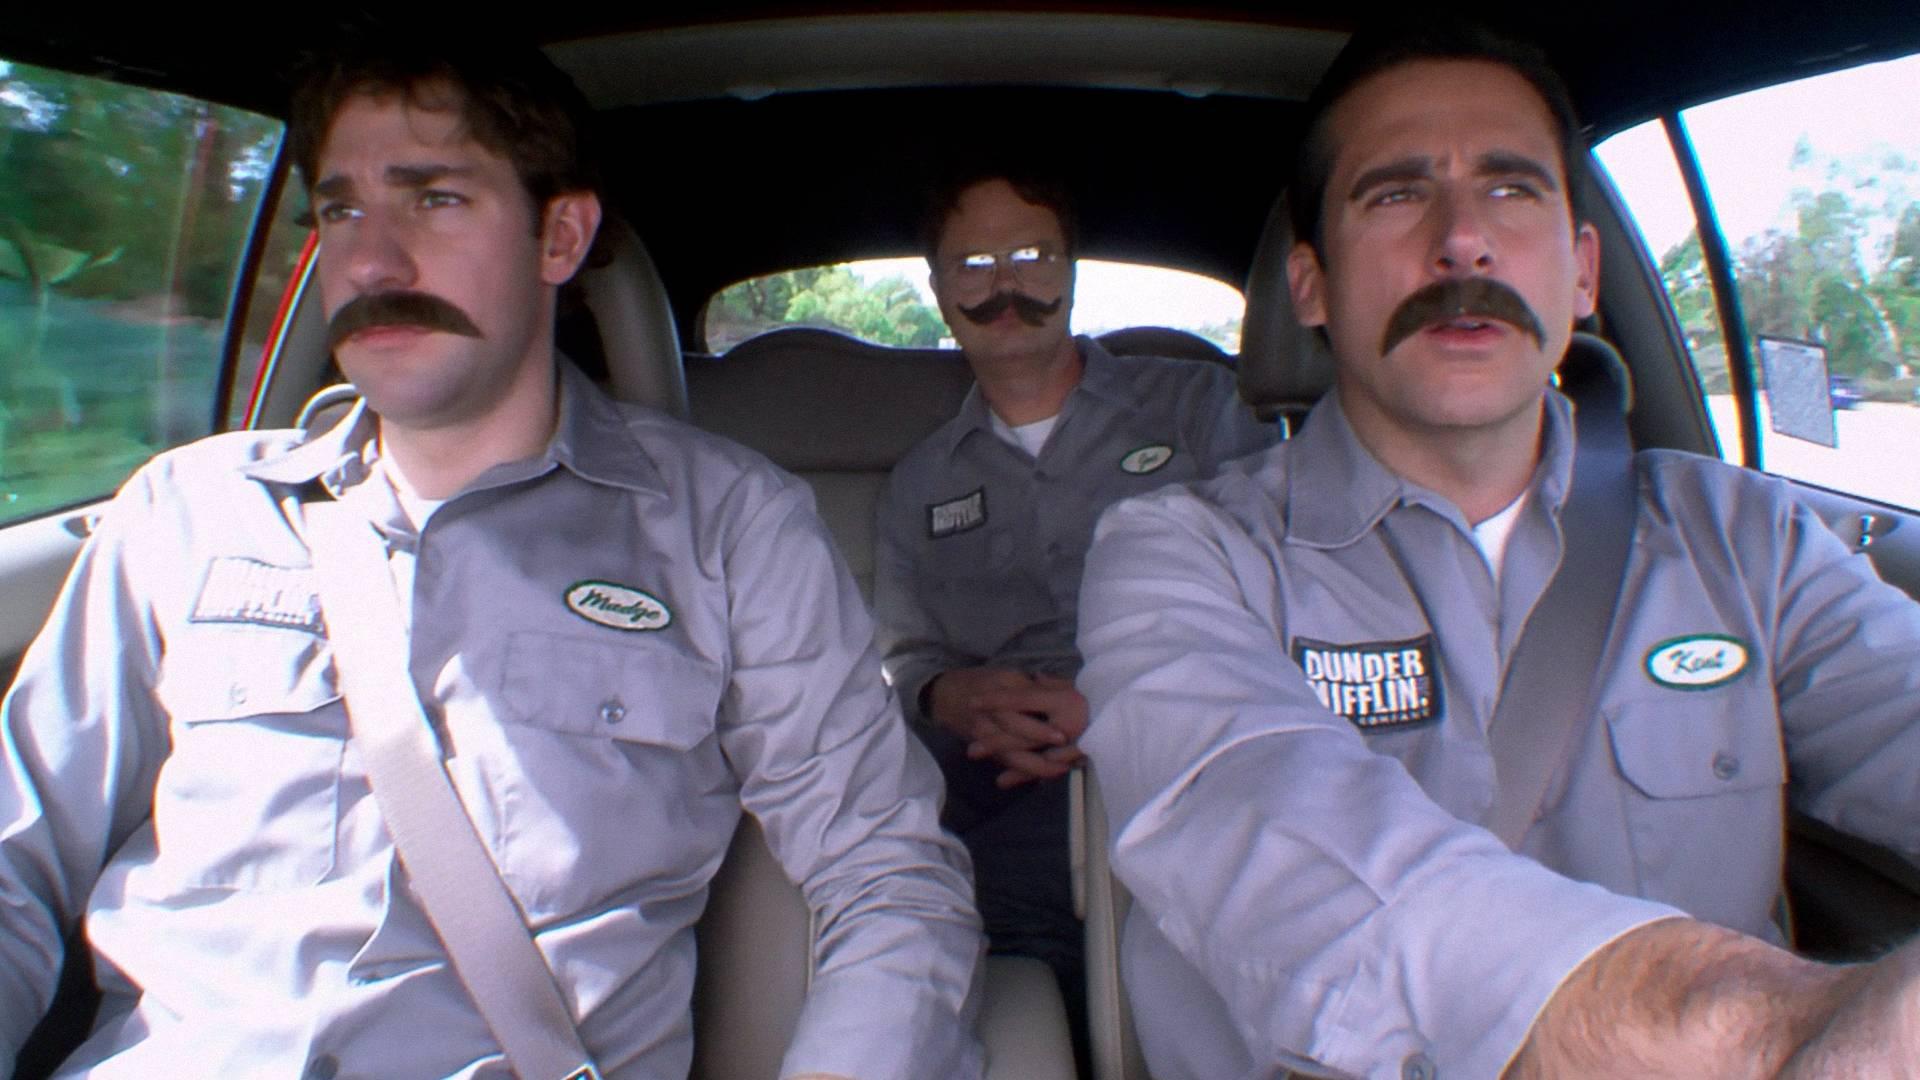 The Office Season 4 Episode 10